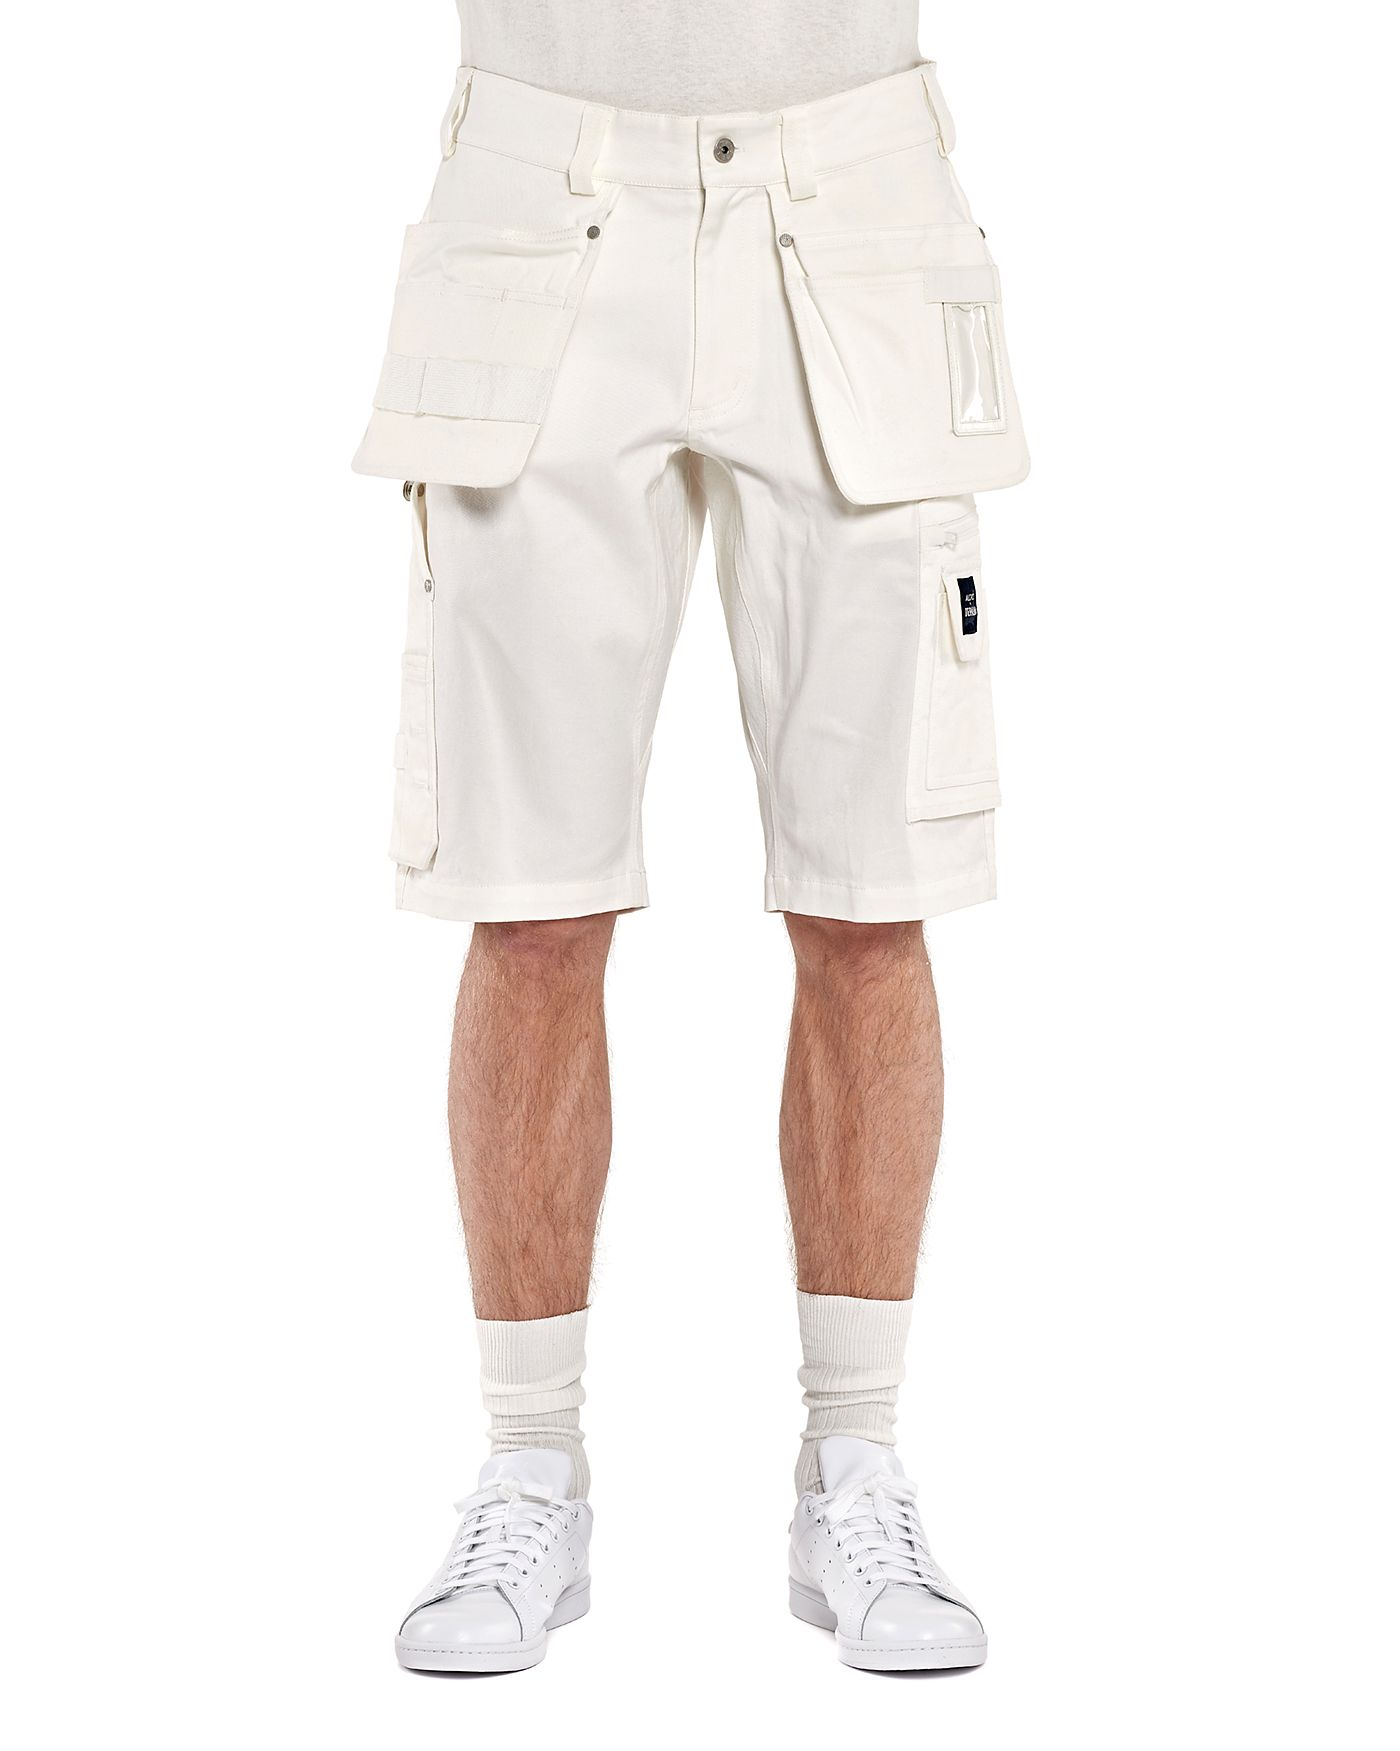 Photo of Alcro Painter Shorts Painter Shorts, White